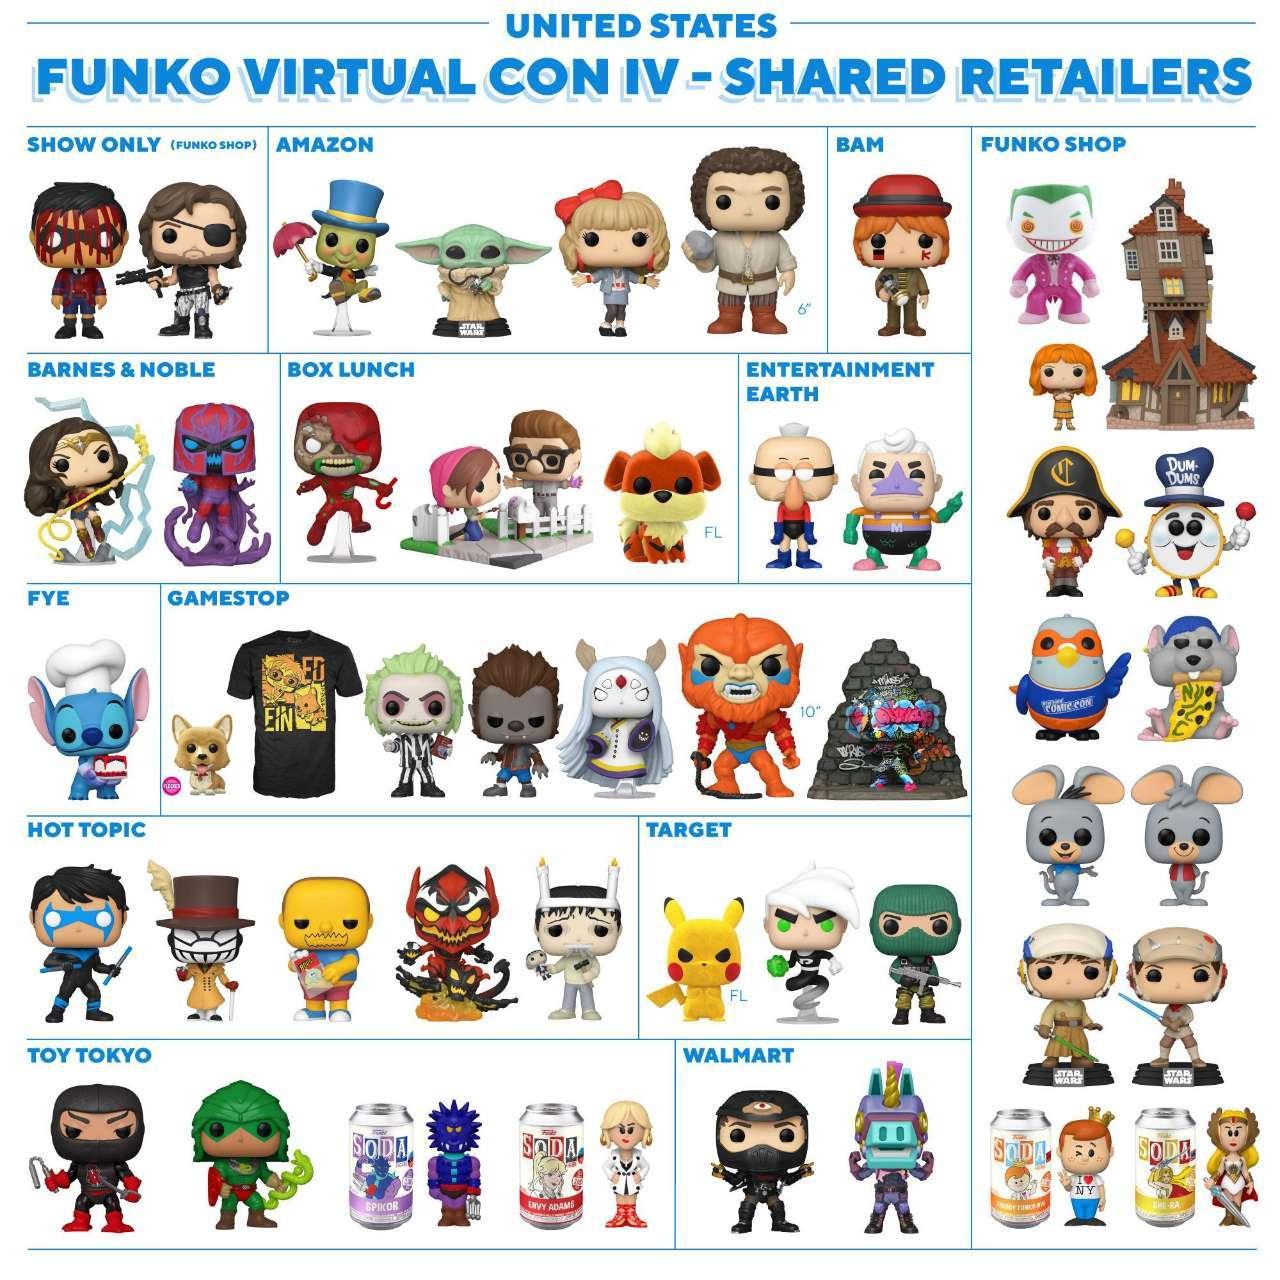 funko-nycc-2020-shared-retailers